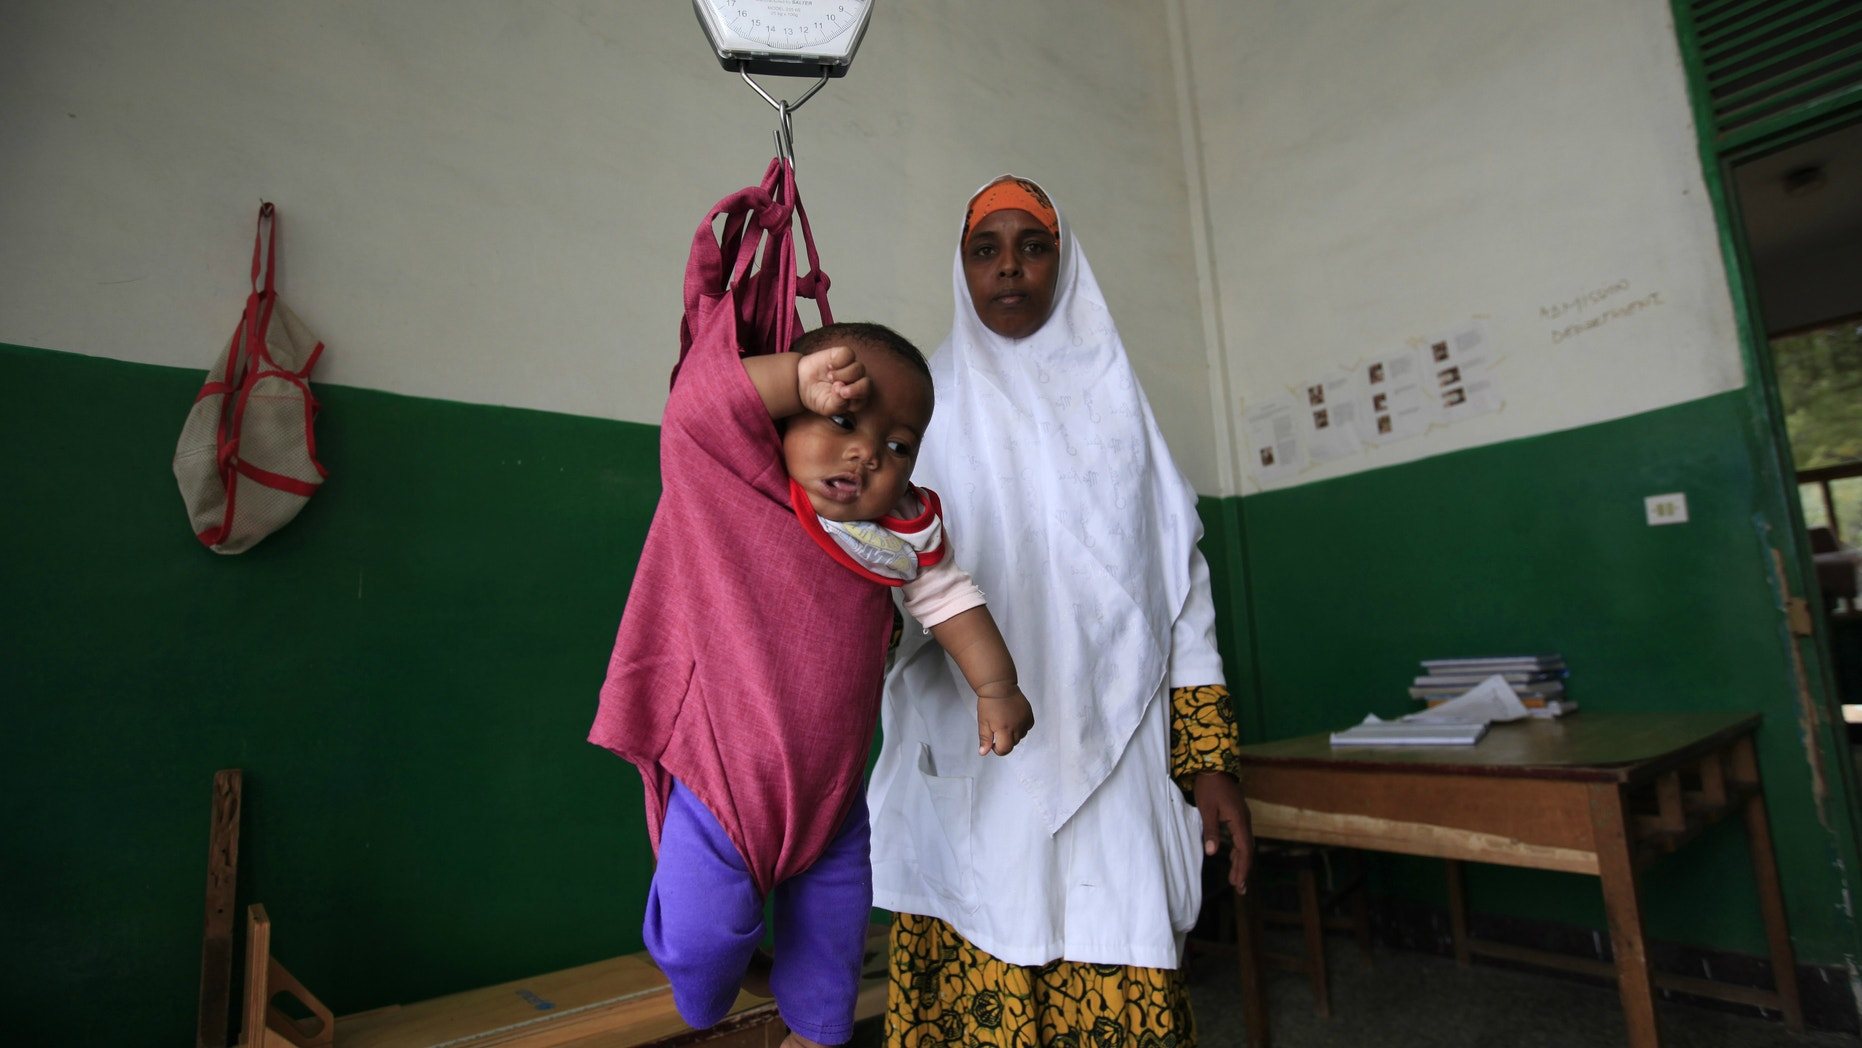 An internally displaced child is weighed at Banadir Hospital in Mogadishu, Somalia.